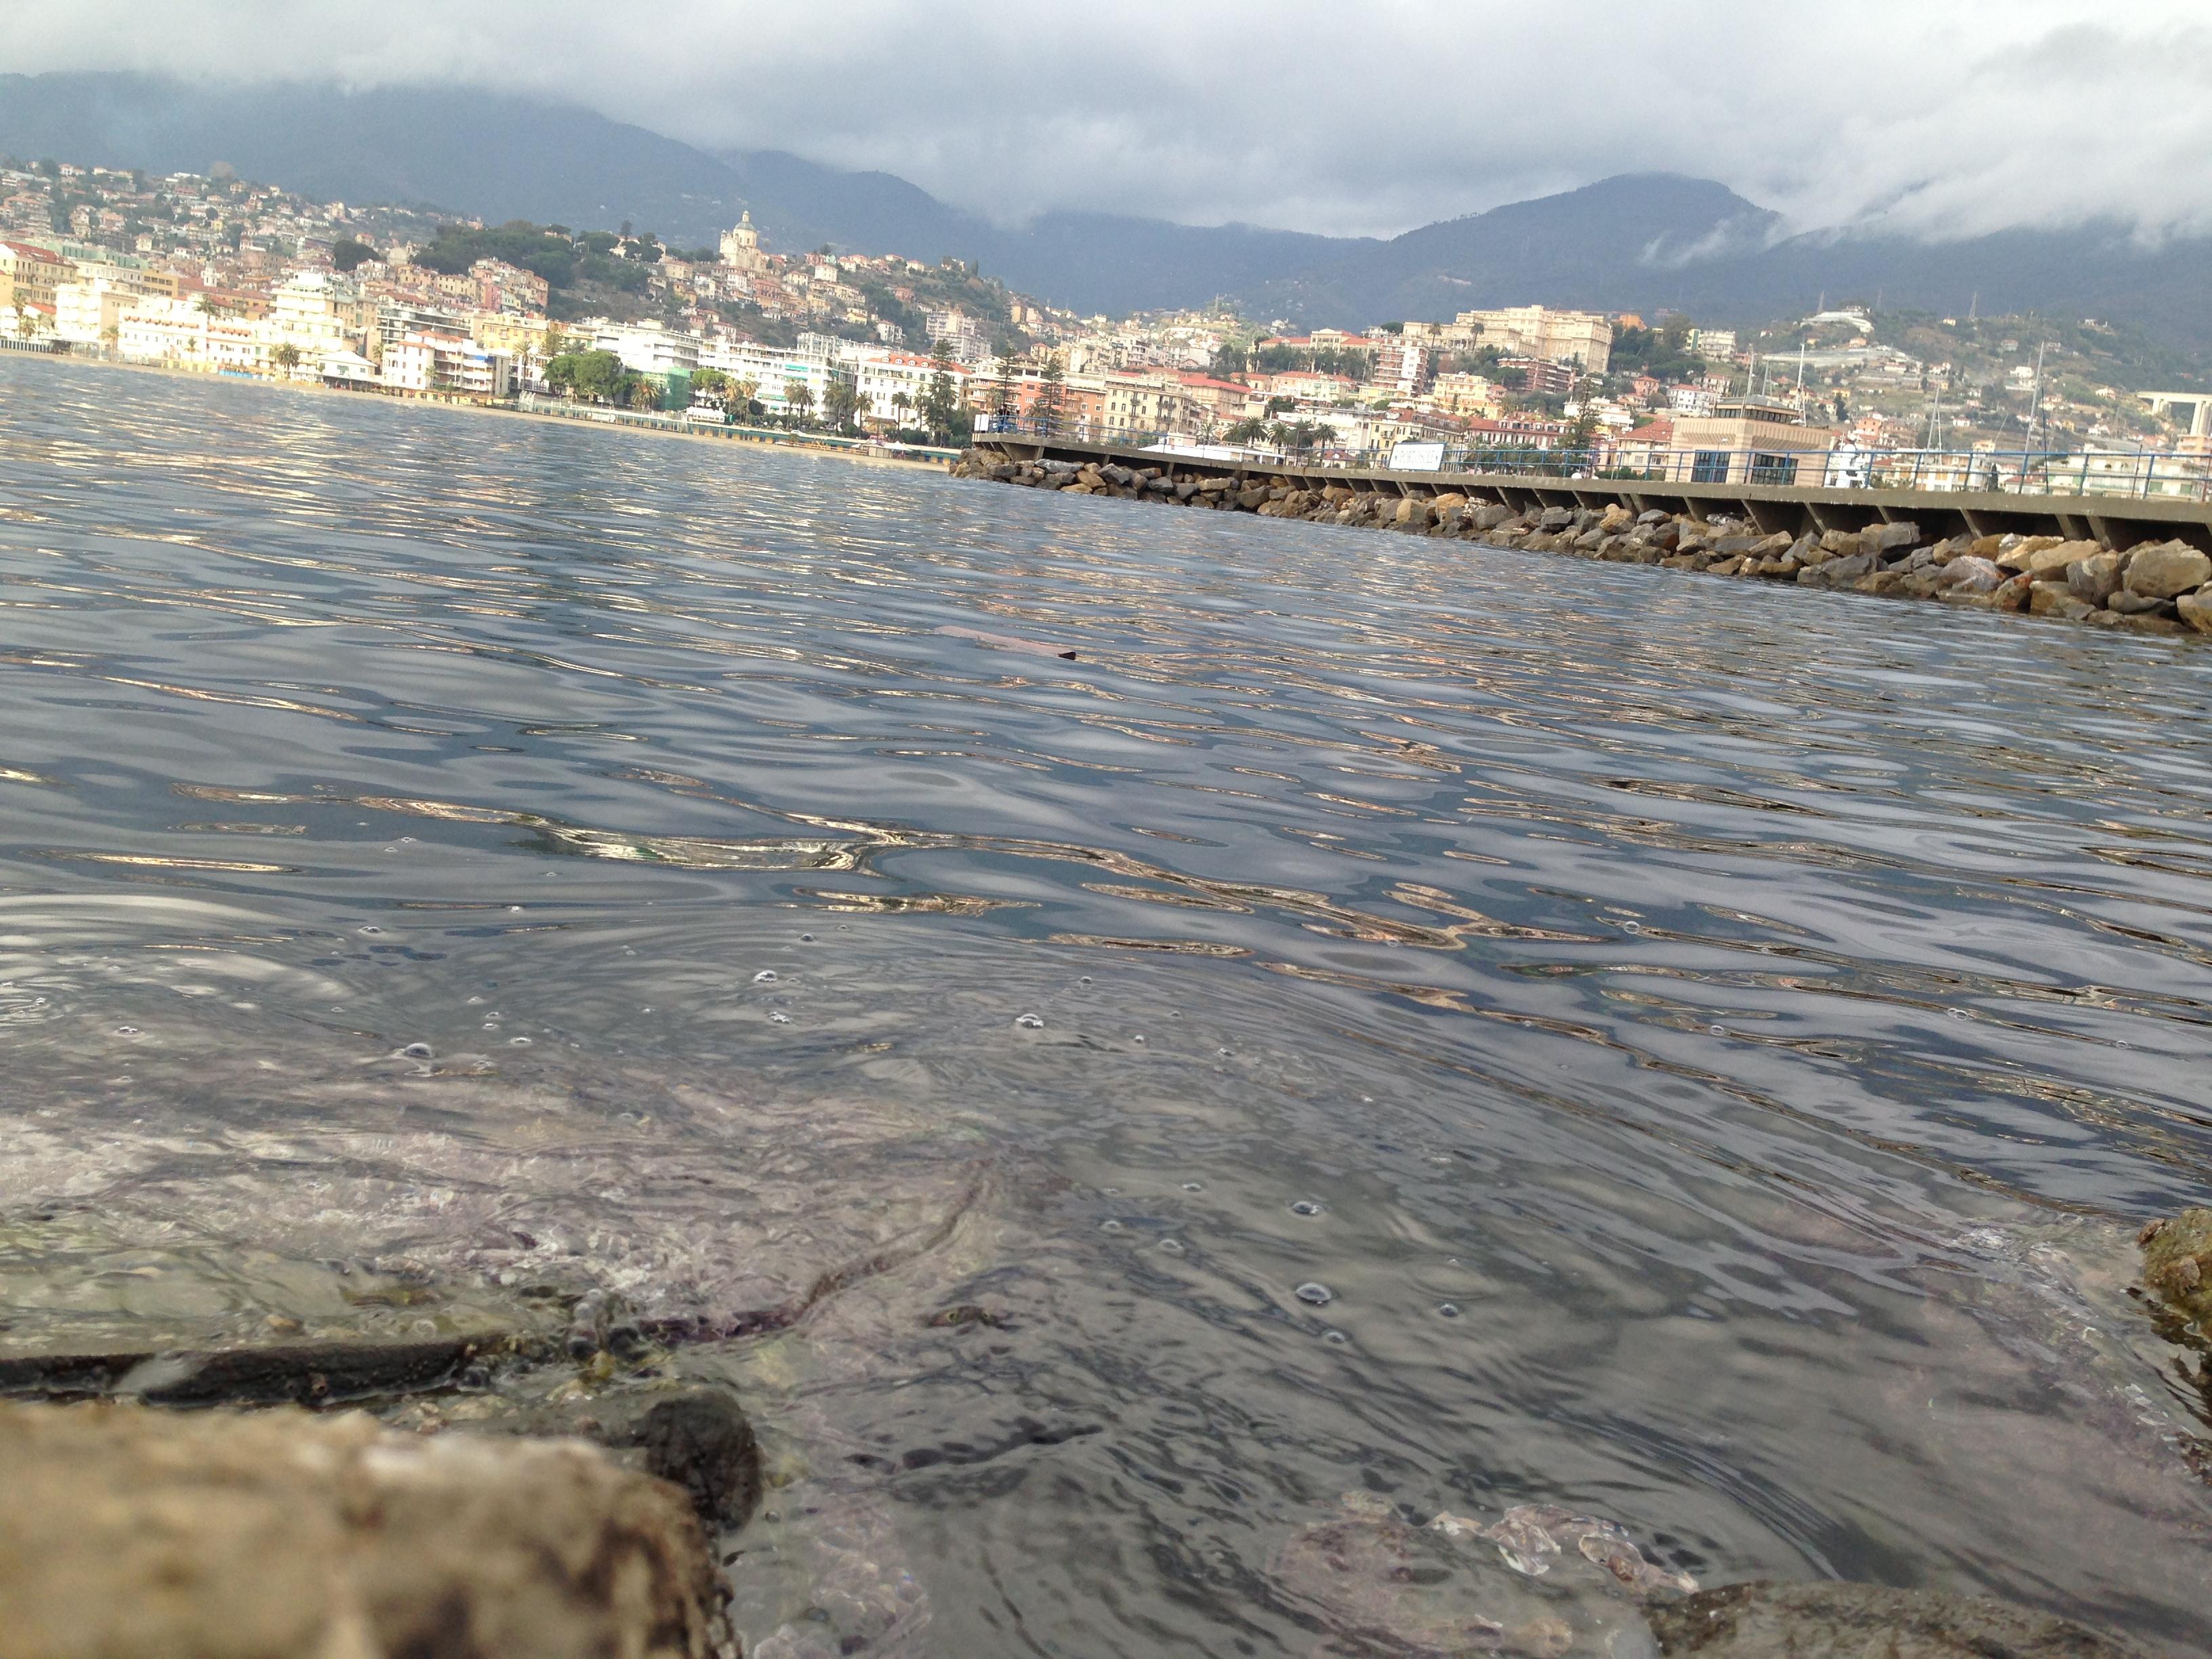 La marina de Portosole à Sanremo